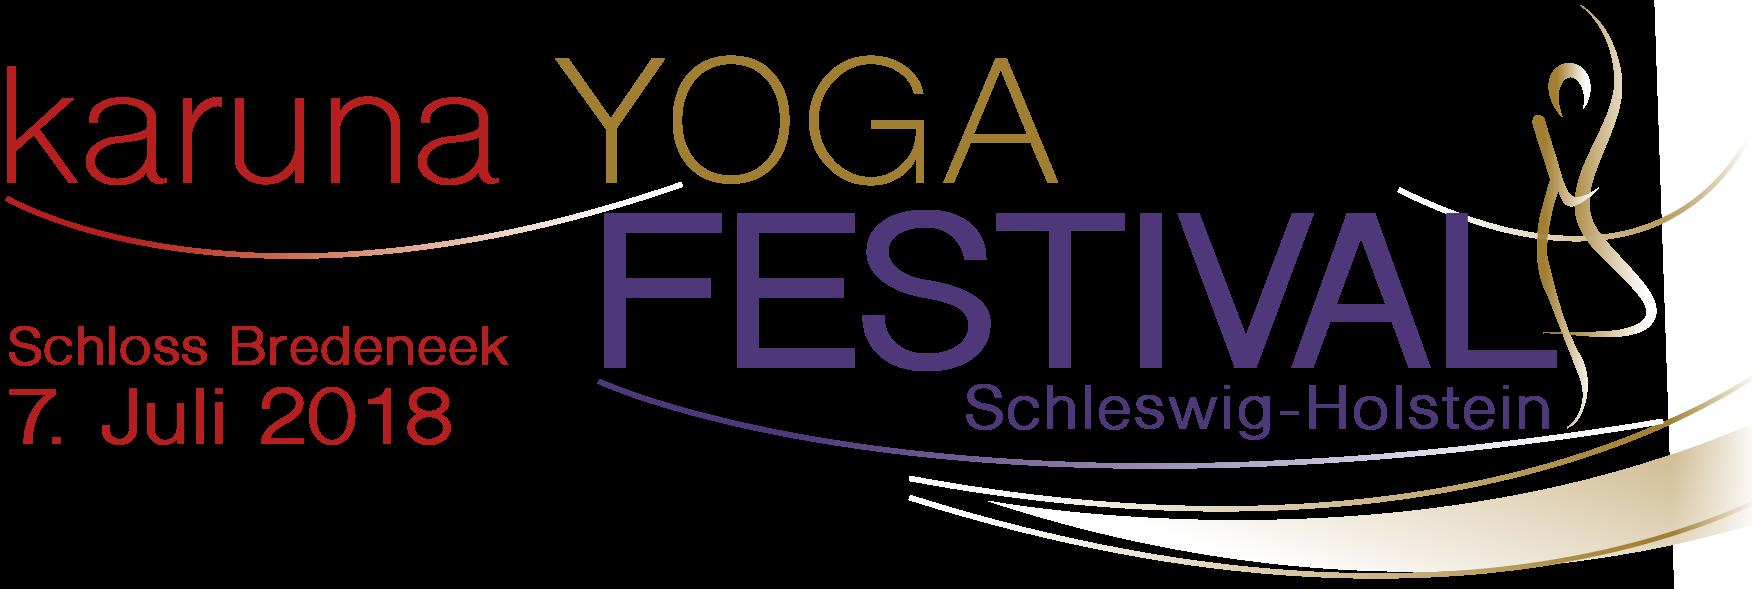 Karuna Yoga Festival 2018